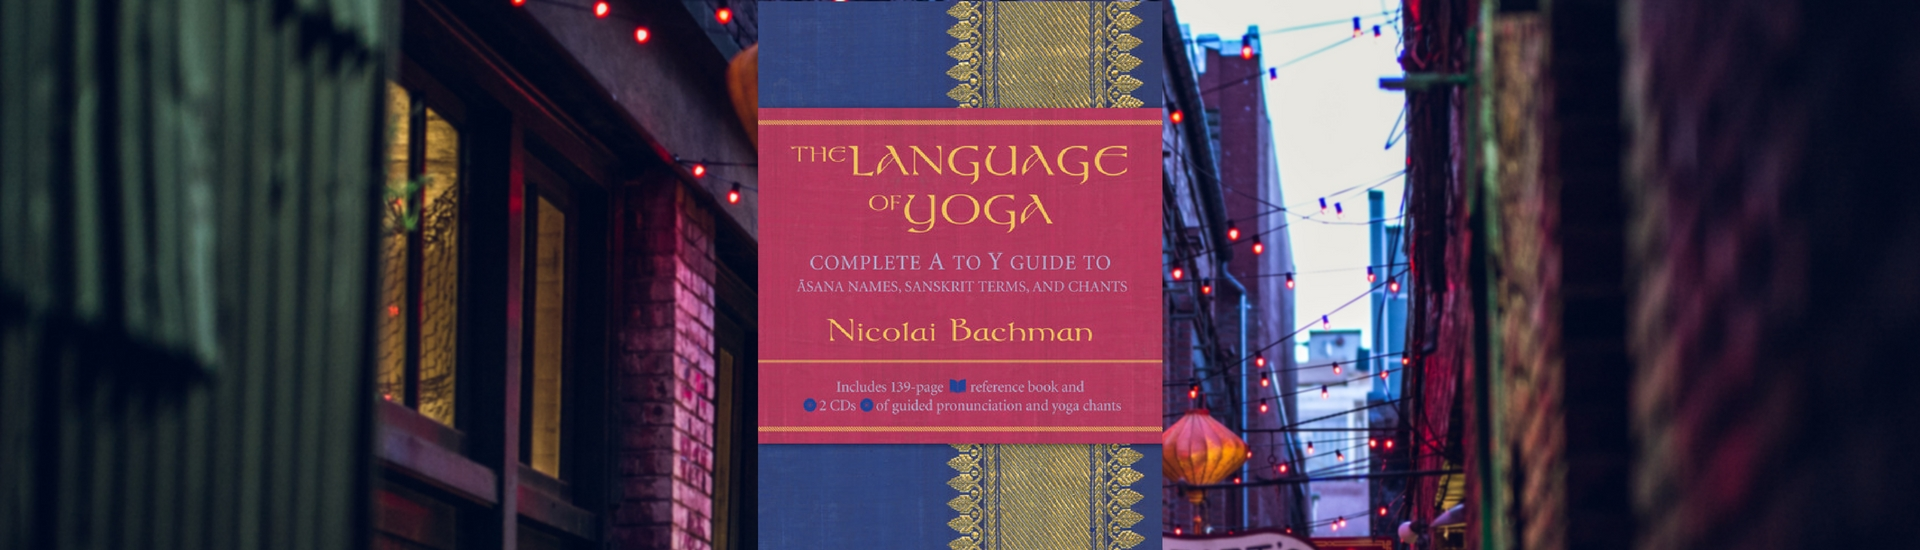 Book Review: The Language of Yoga - Sanskrit